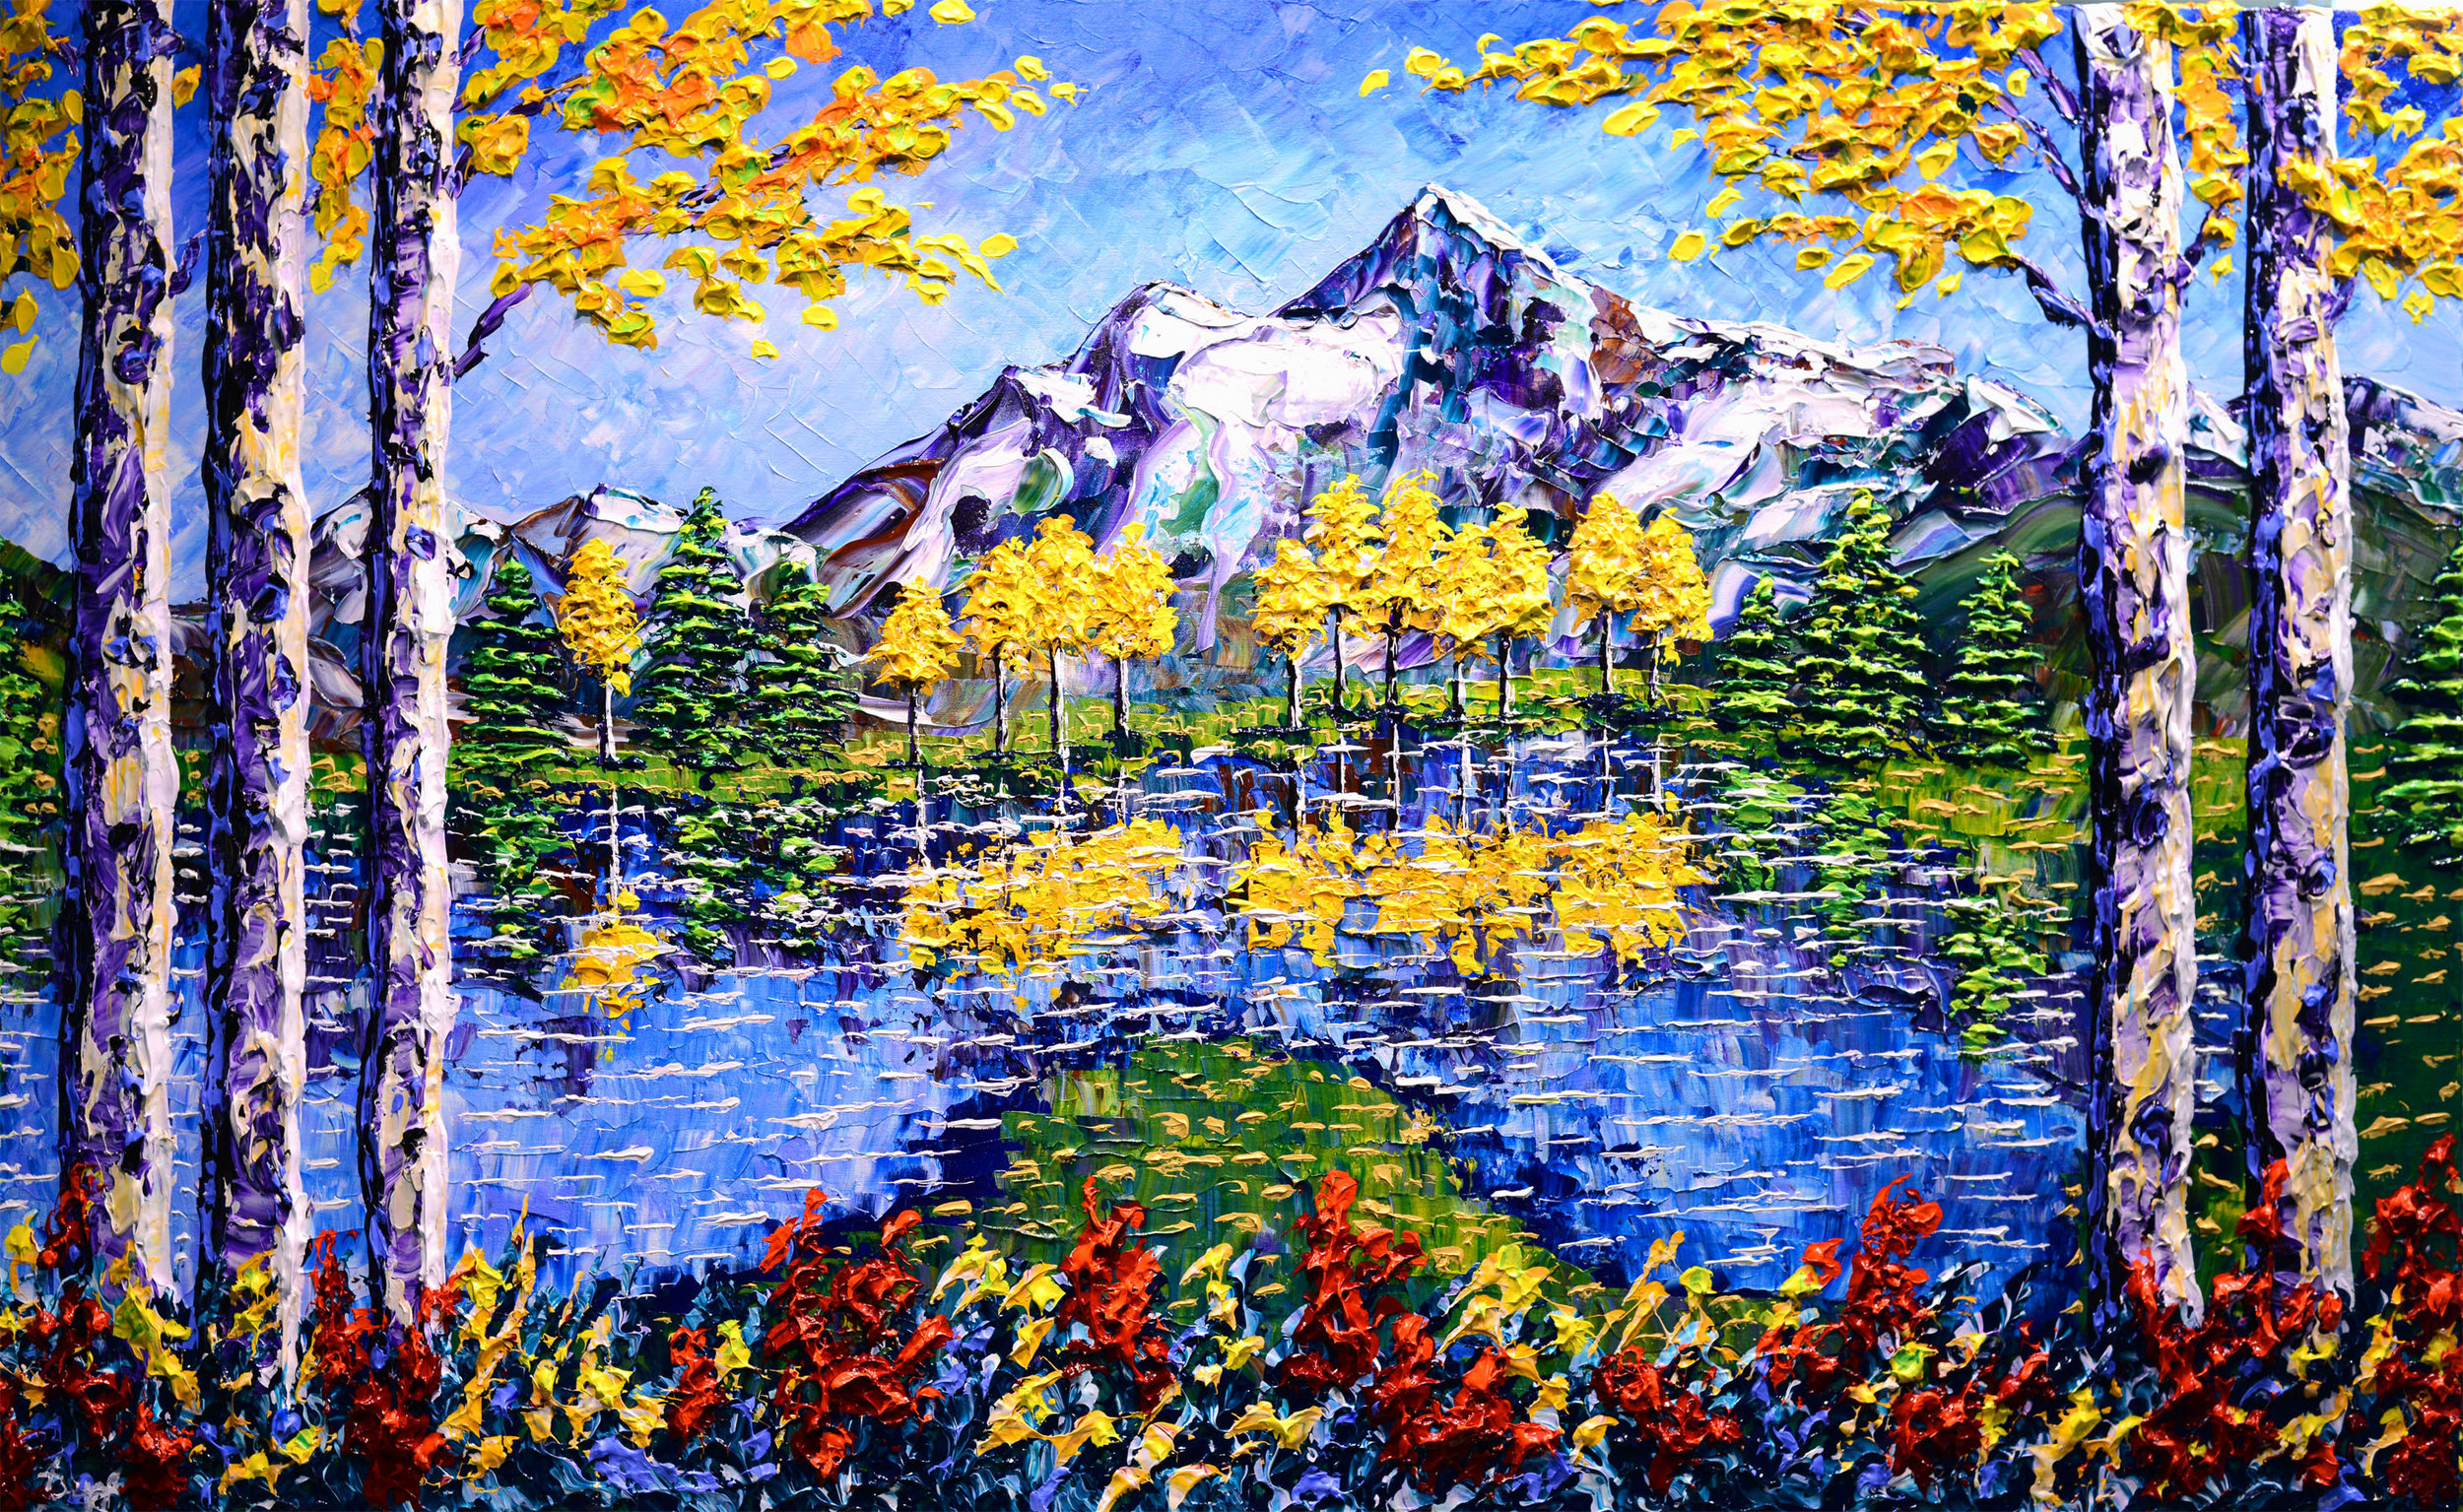 Beauty-along-the-Mountain-Streams-36x60.jpg